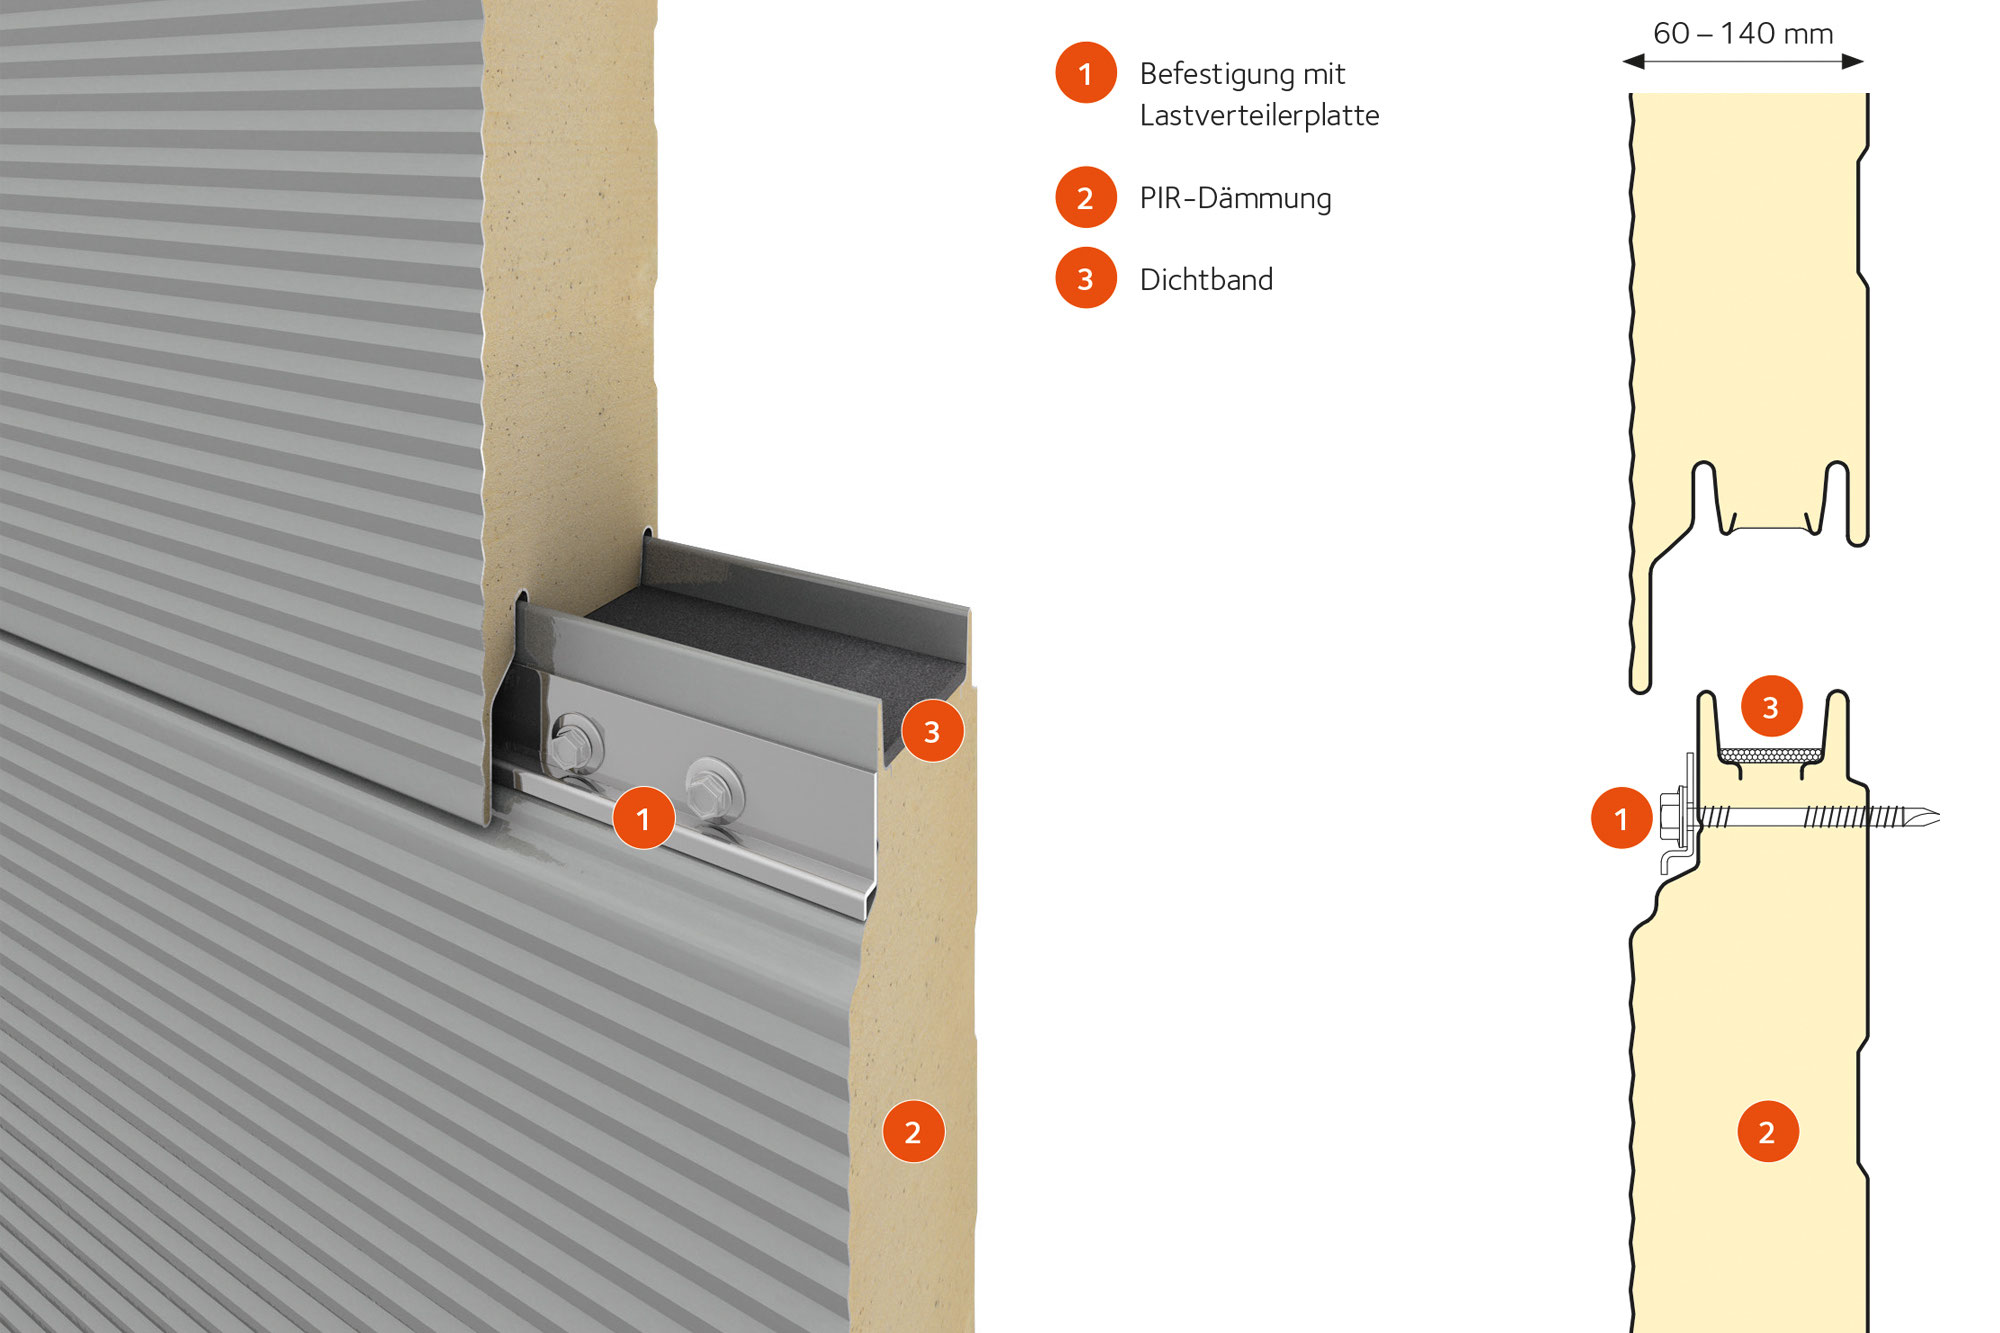 sandwichprofile f r wand und dach profilservices webseite. Black Bedroom Furniture Sets. Home Design Ideas